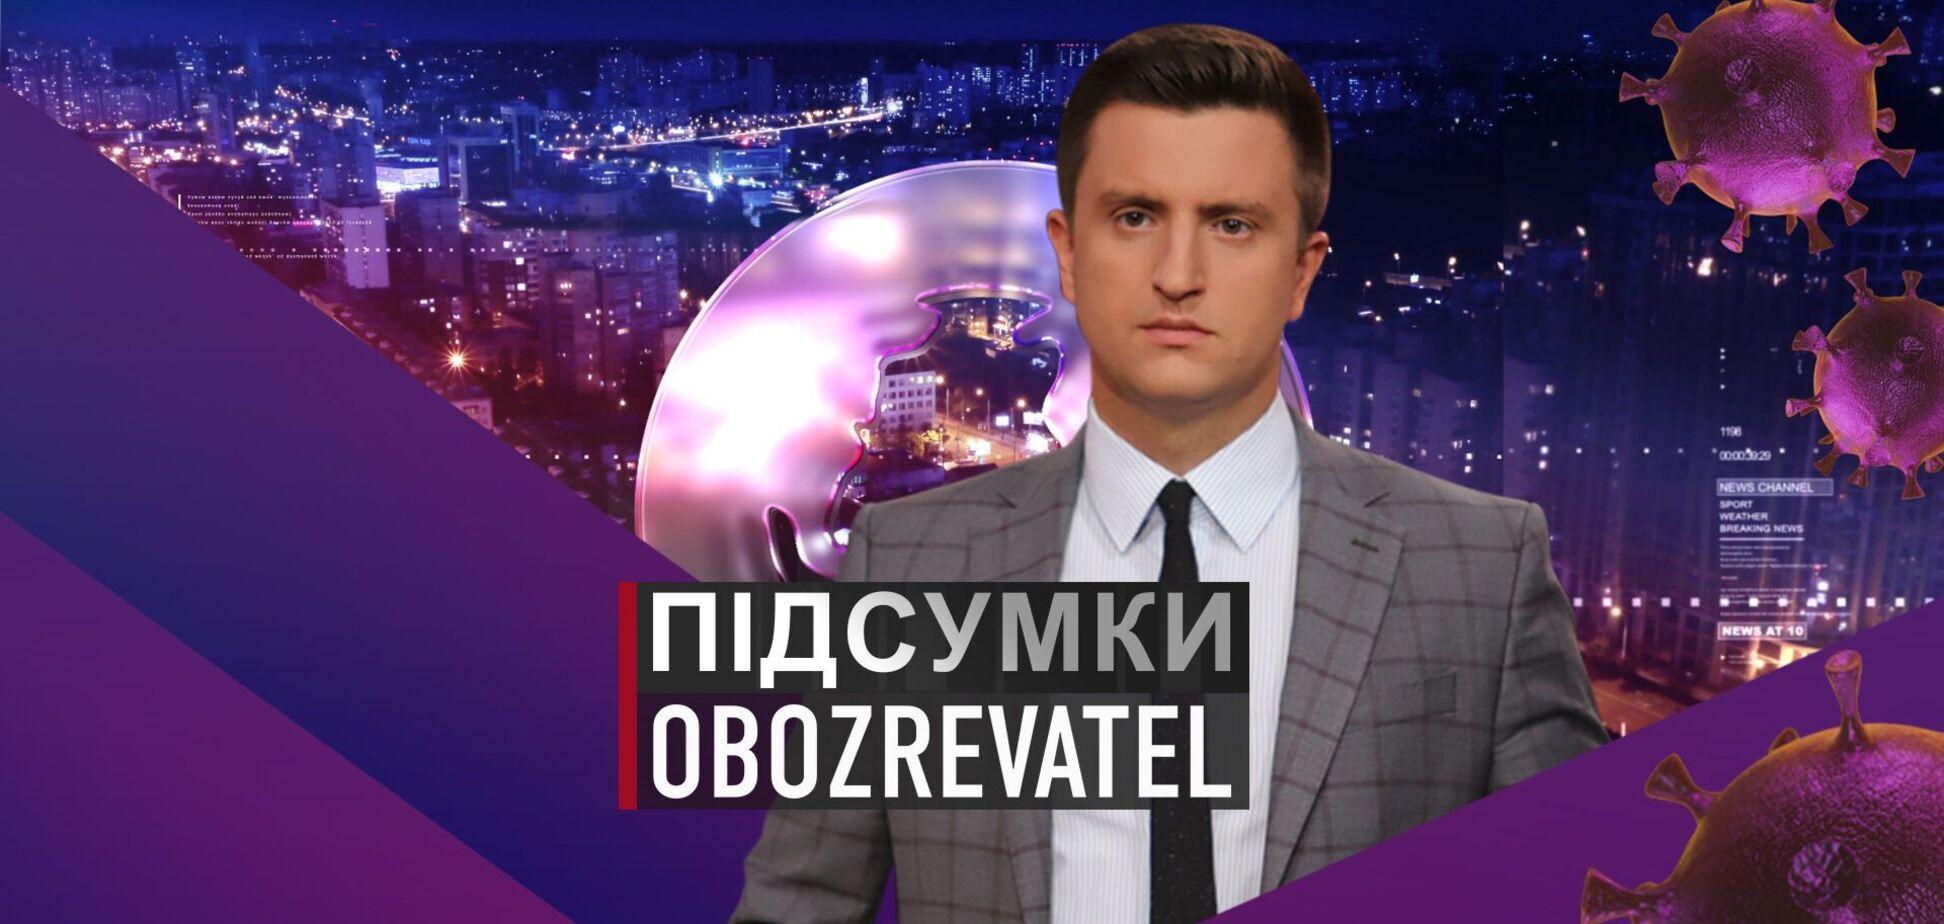 Підсумки с Вадимом Колодийчуком. Пятница, 16 июля